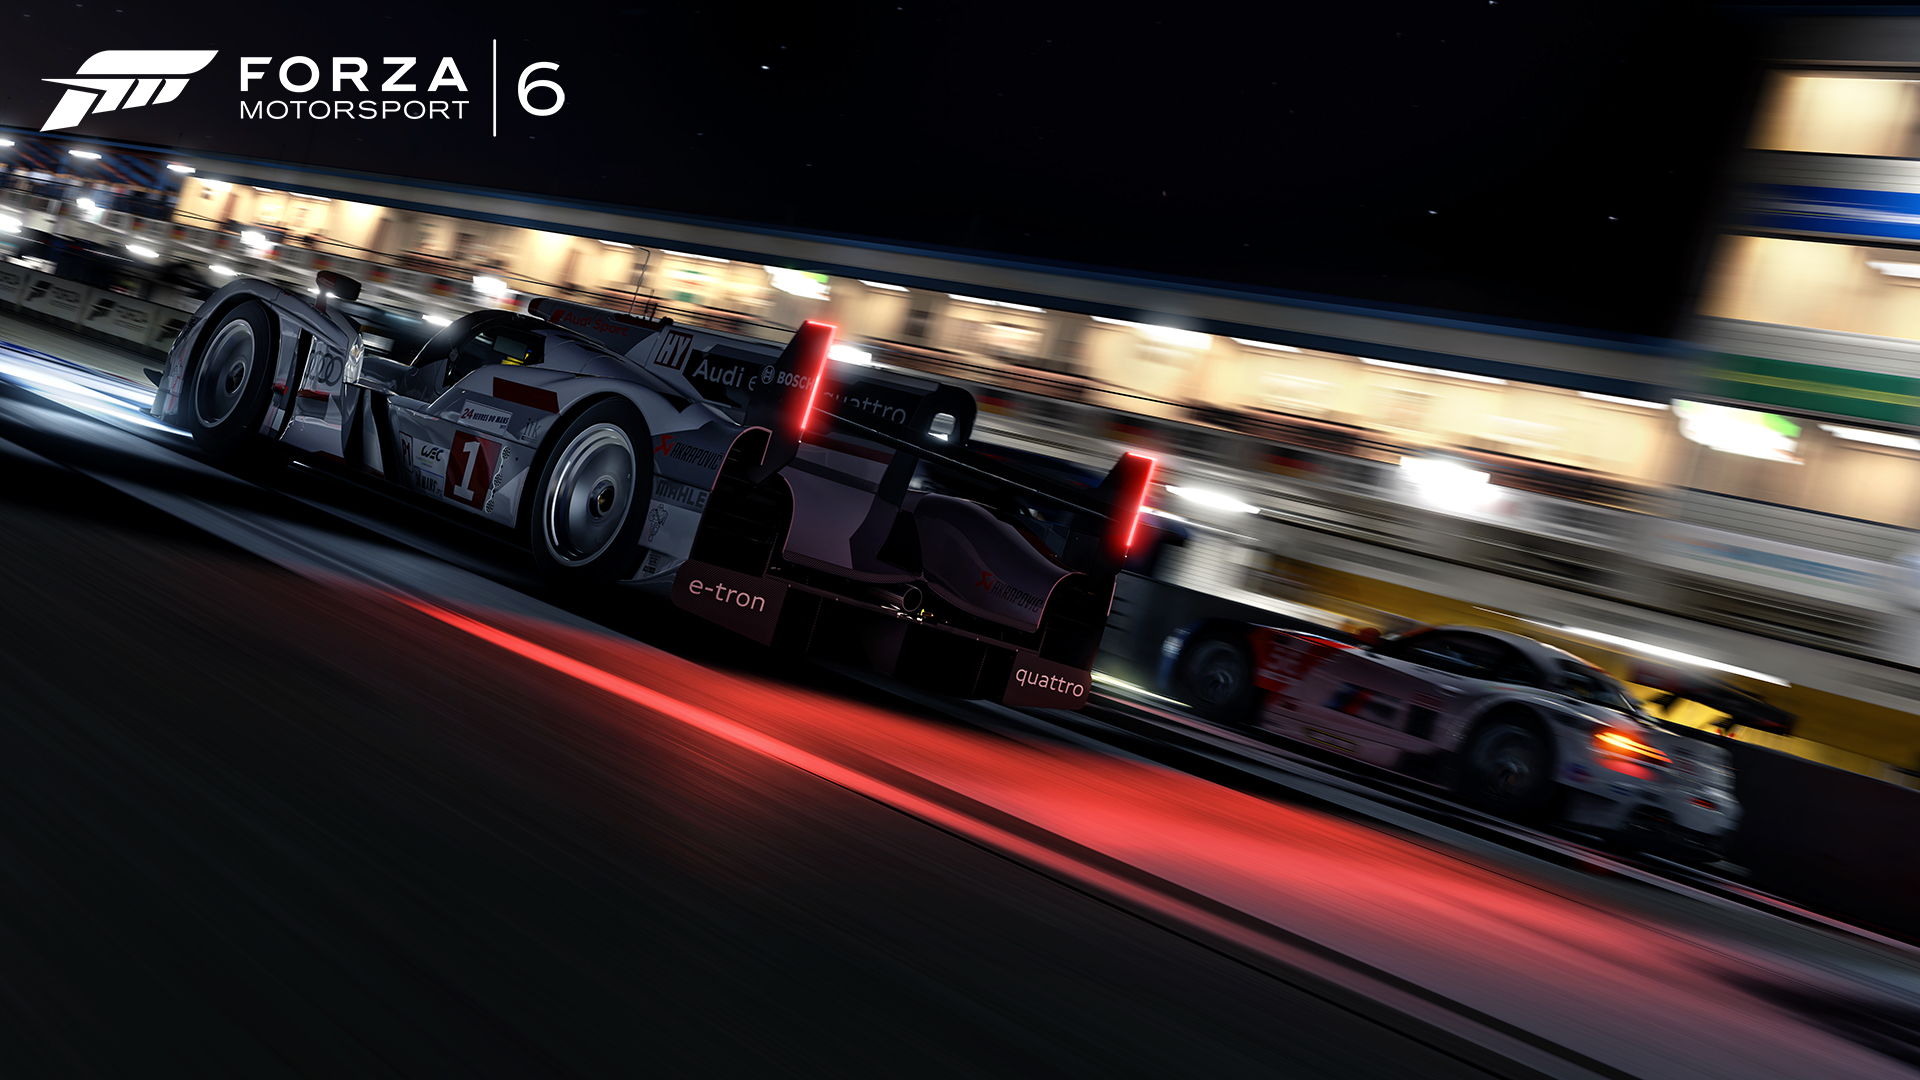 Forza Motorsport 6 Wallpapers ID601850